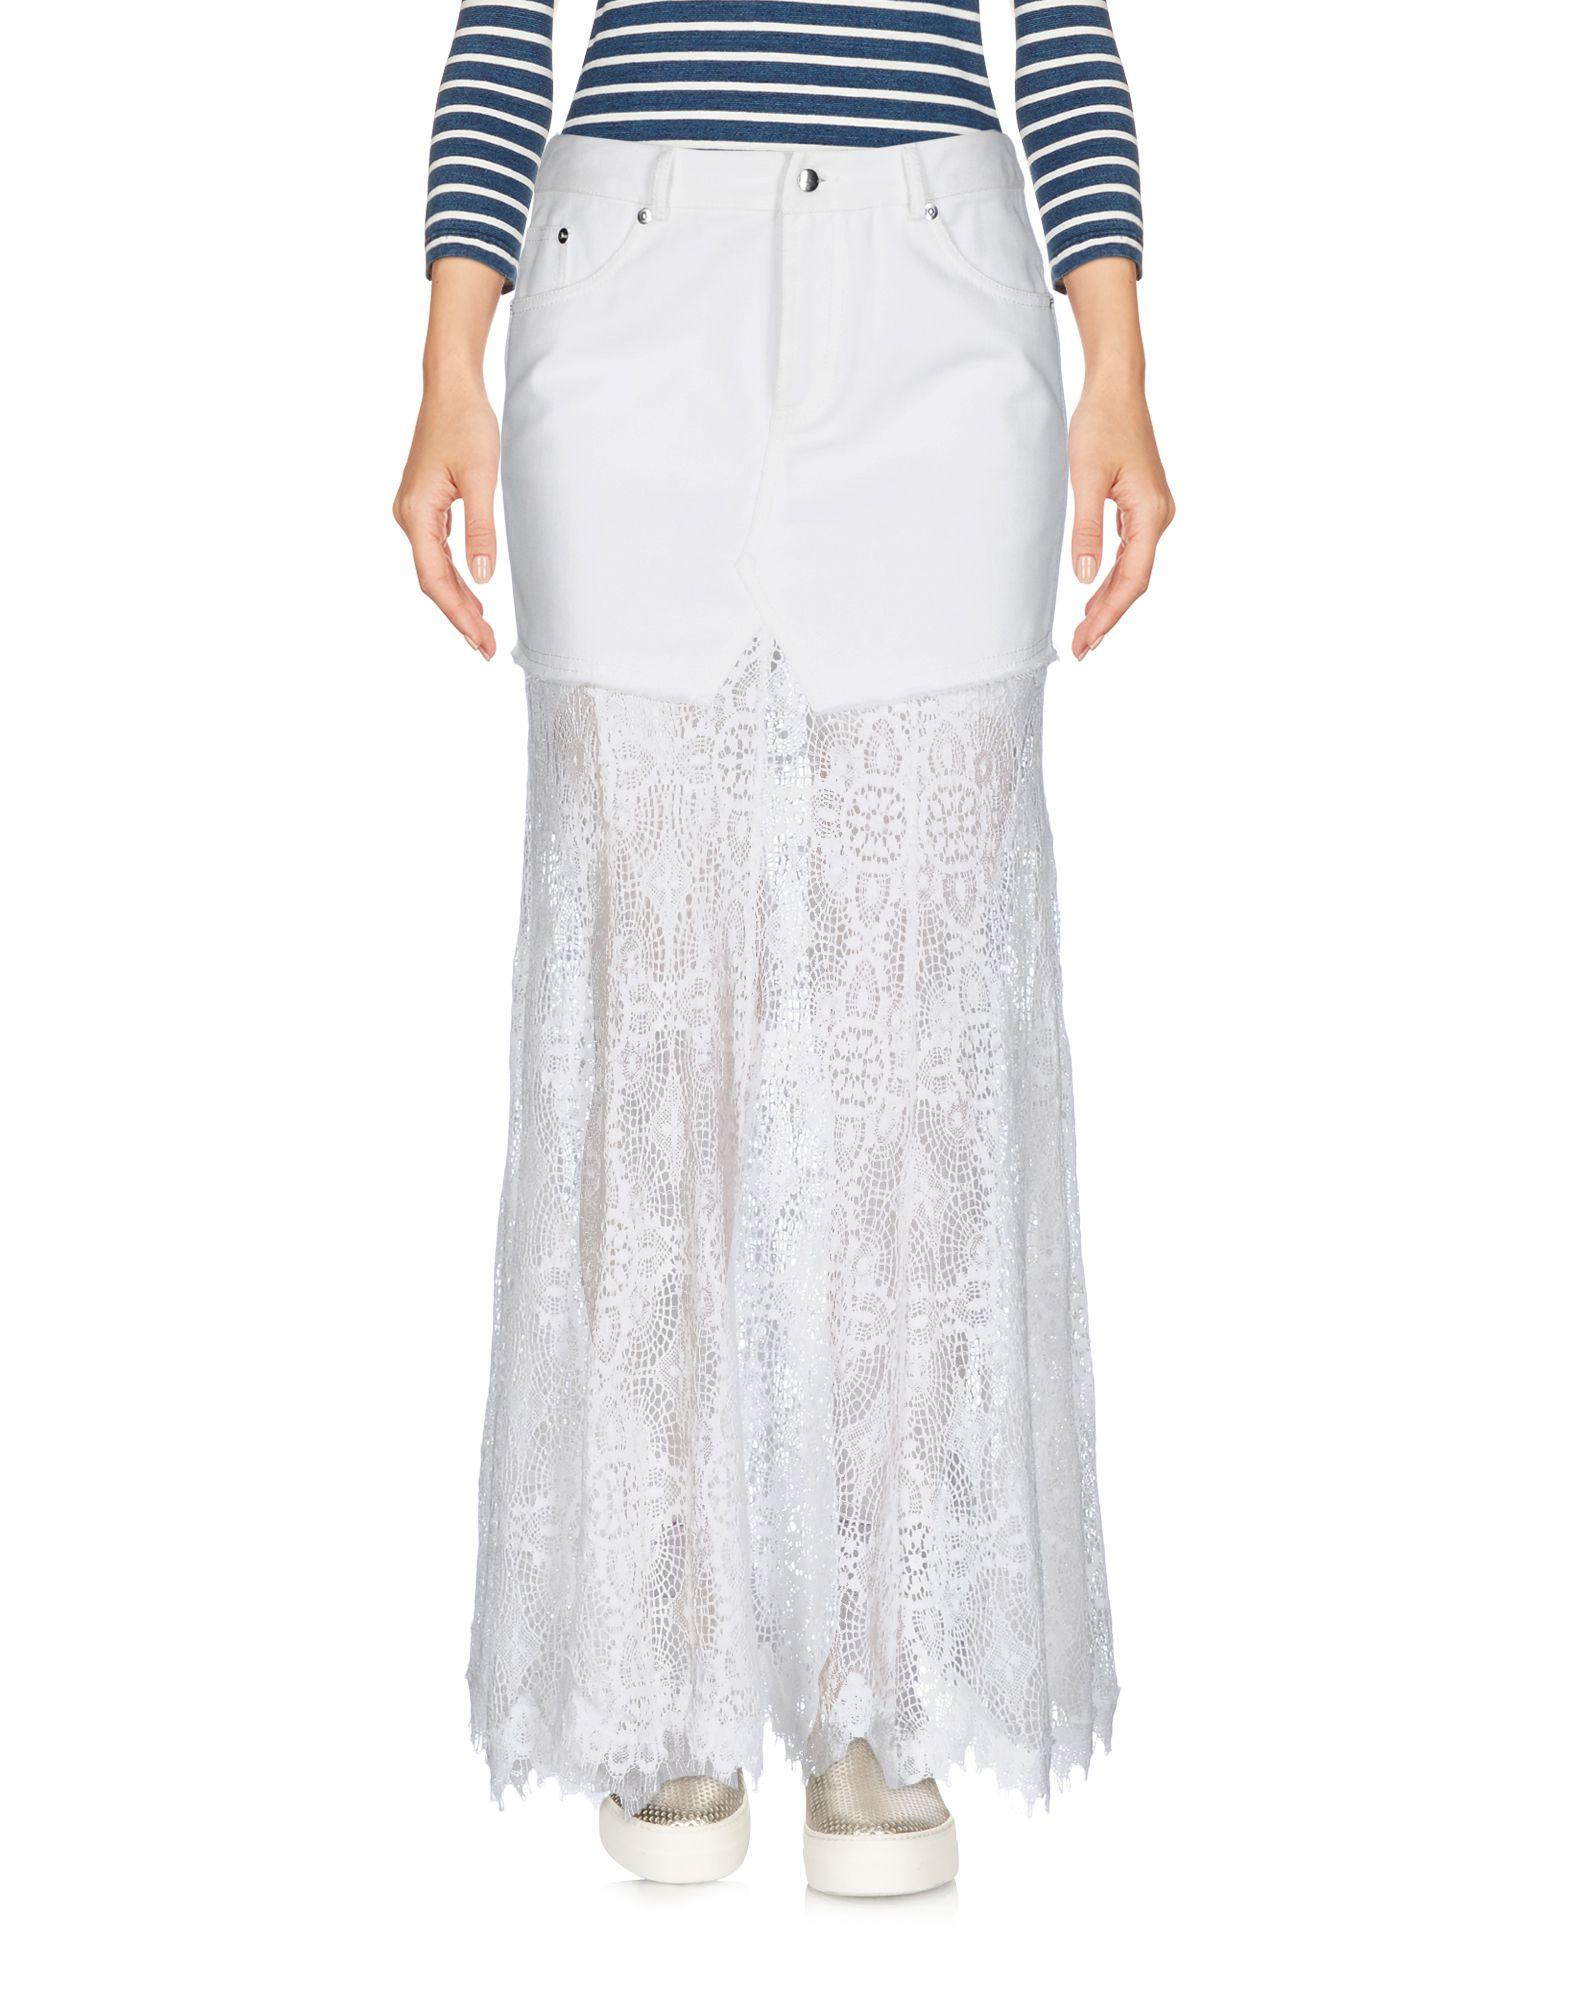 McQ Alexander McQueen Джинсовая юбка topshop джинсовая юбка